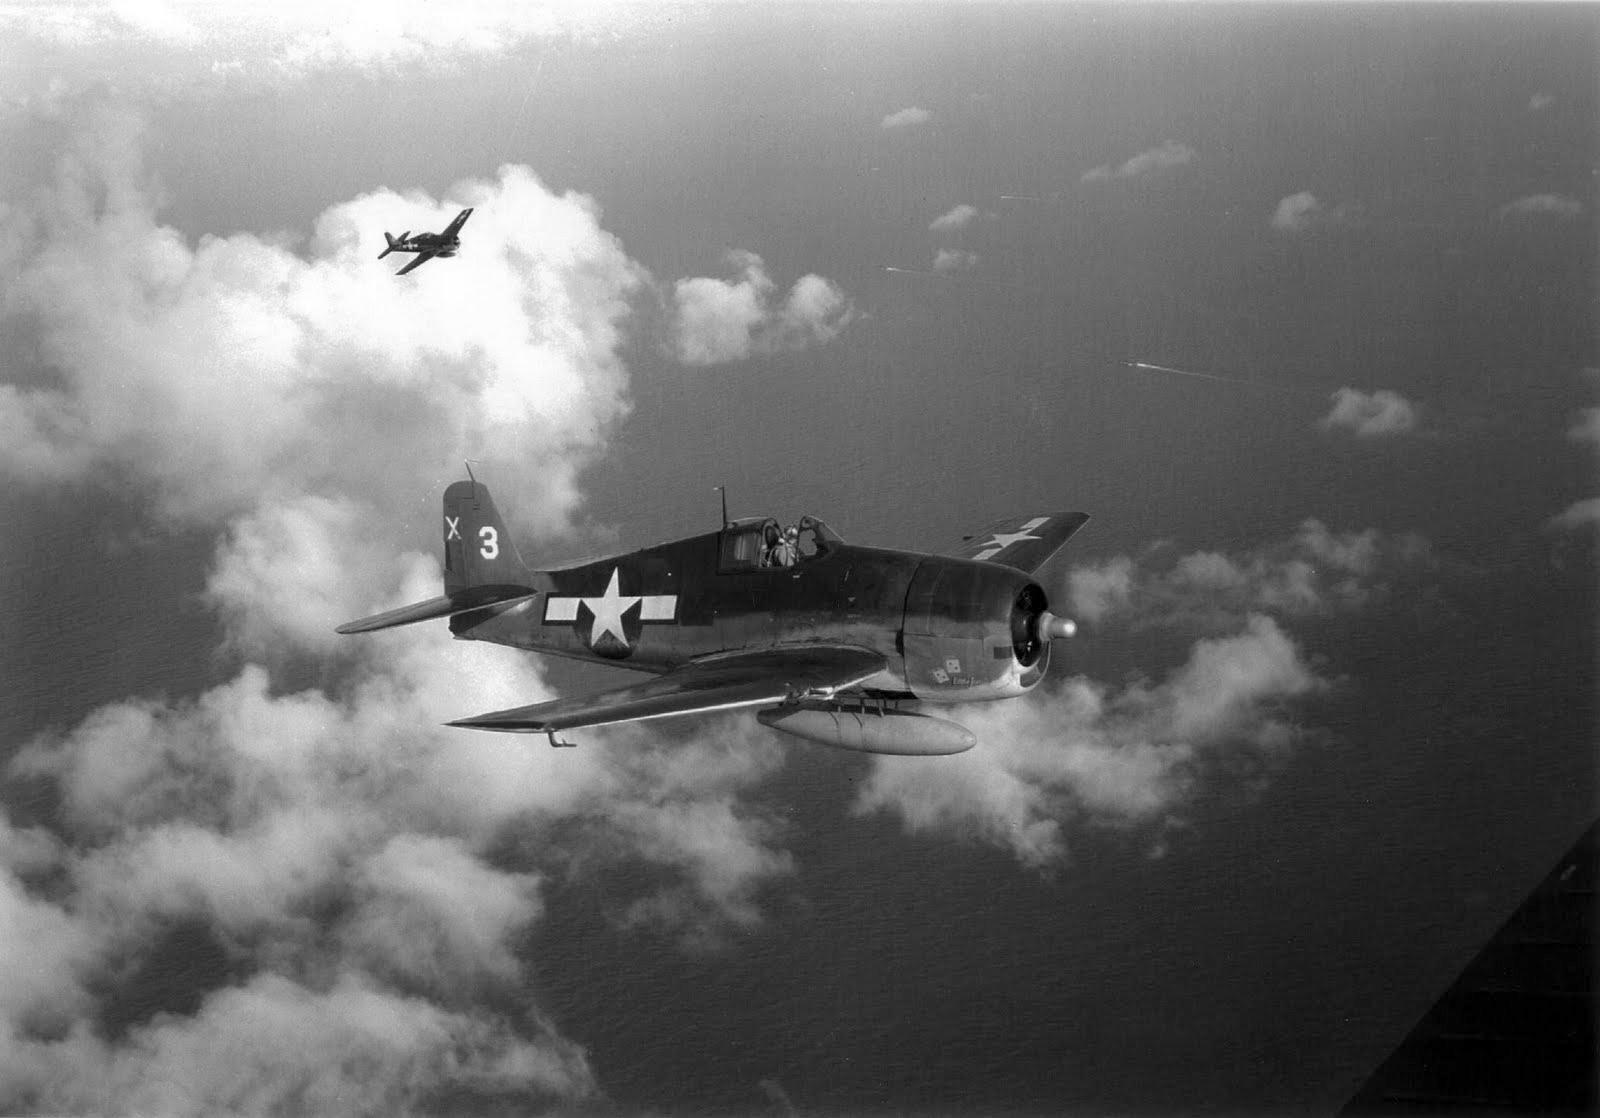 Grumman F6F 5 Hellcat VF 51 White 3X Little Joe from CVL 30 USS San Jacinto 20th July 1944 01